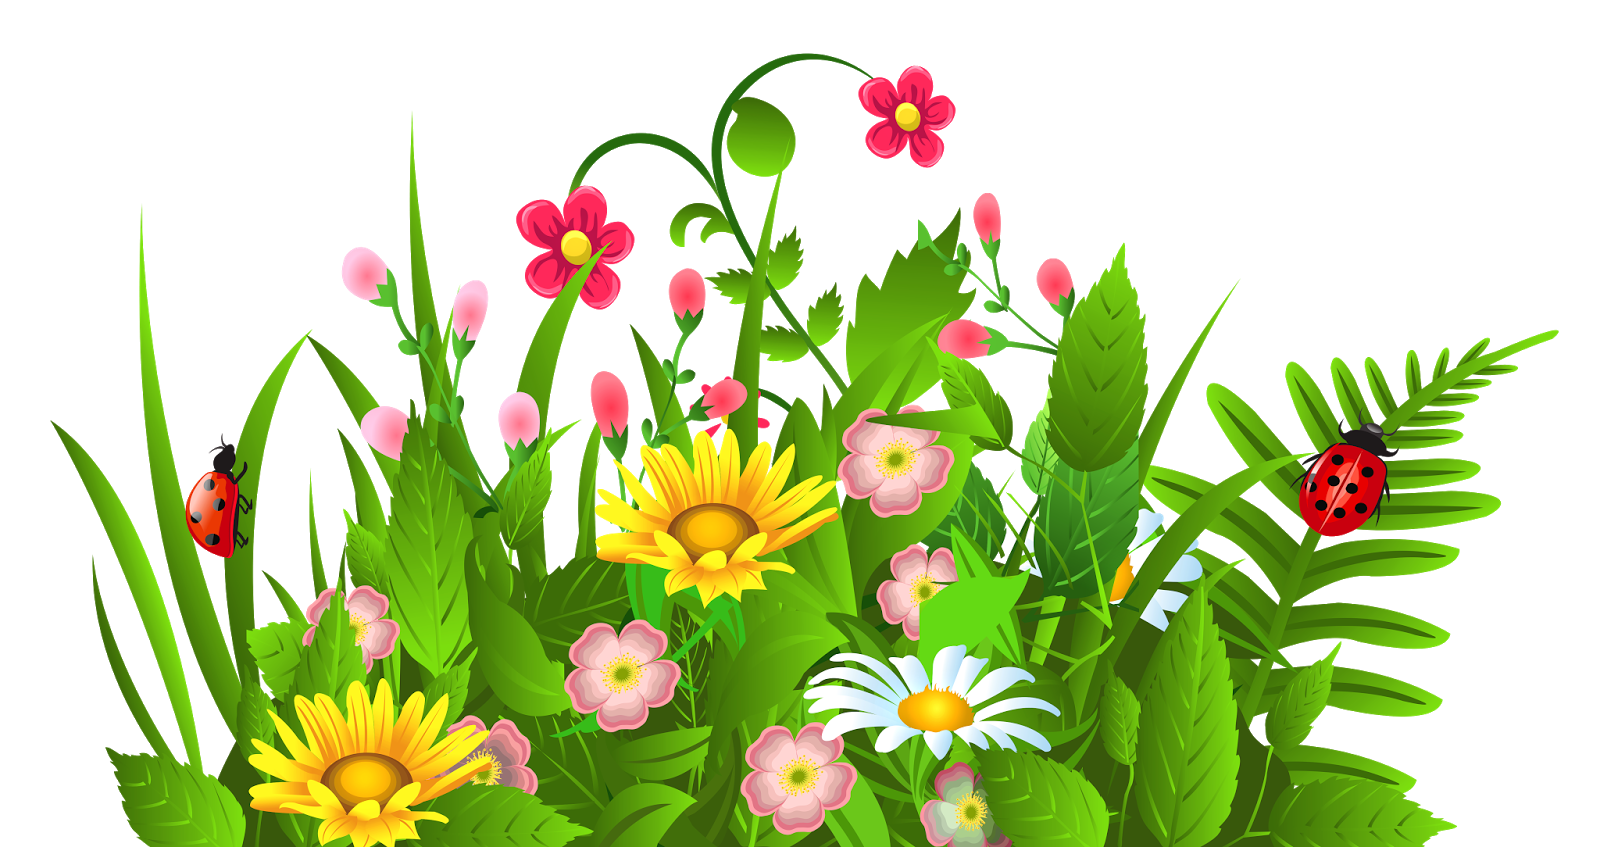 Flower garden clipart 8.